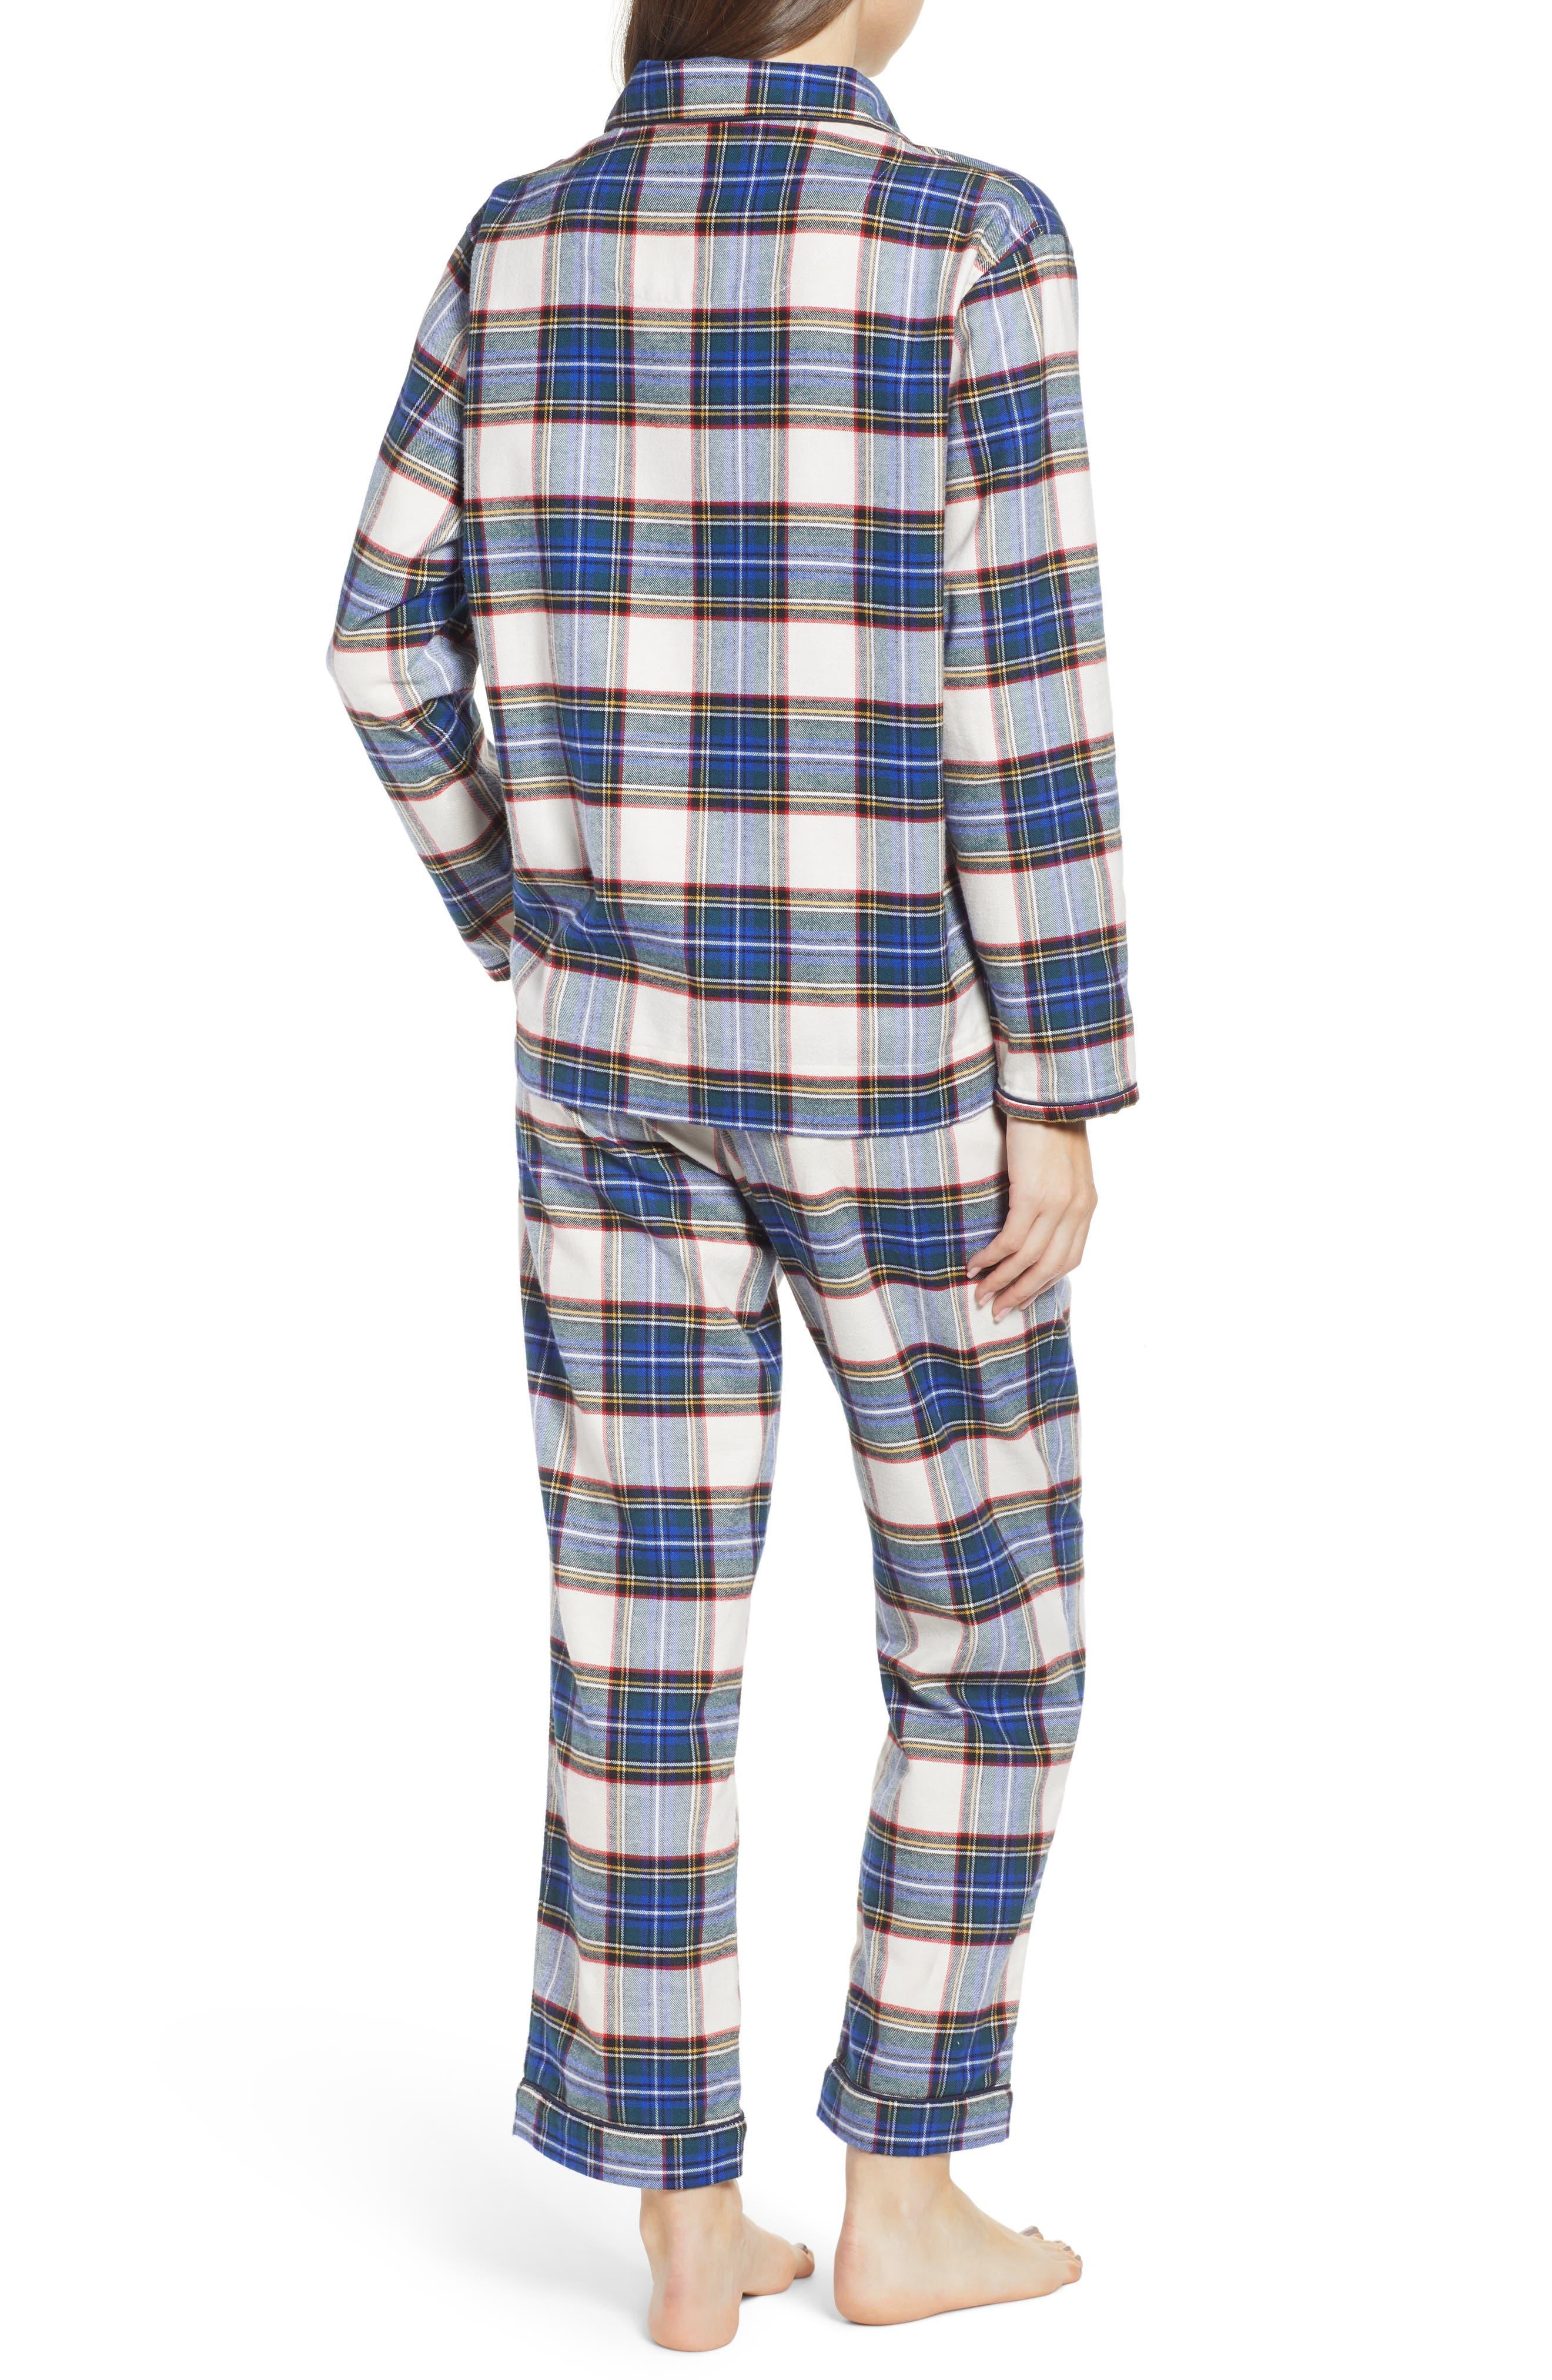 Bishop Women's Pajamas,                             Alternate thumbnail 2, color,                             FLANNEL PLAID